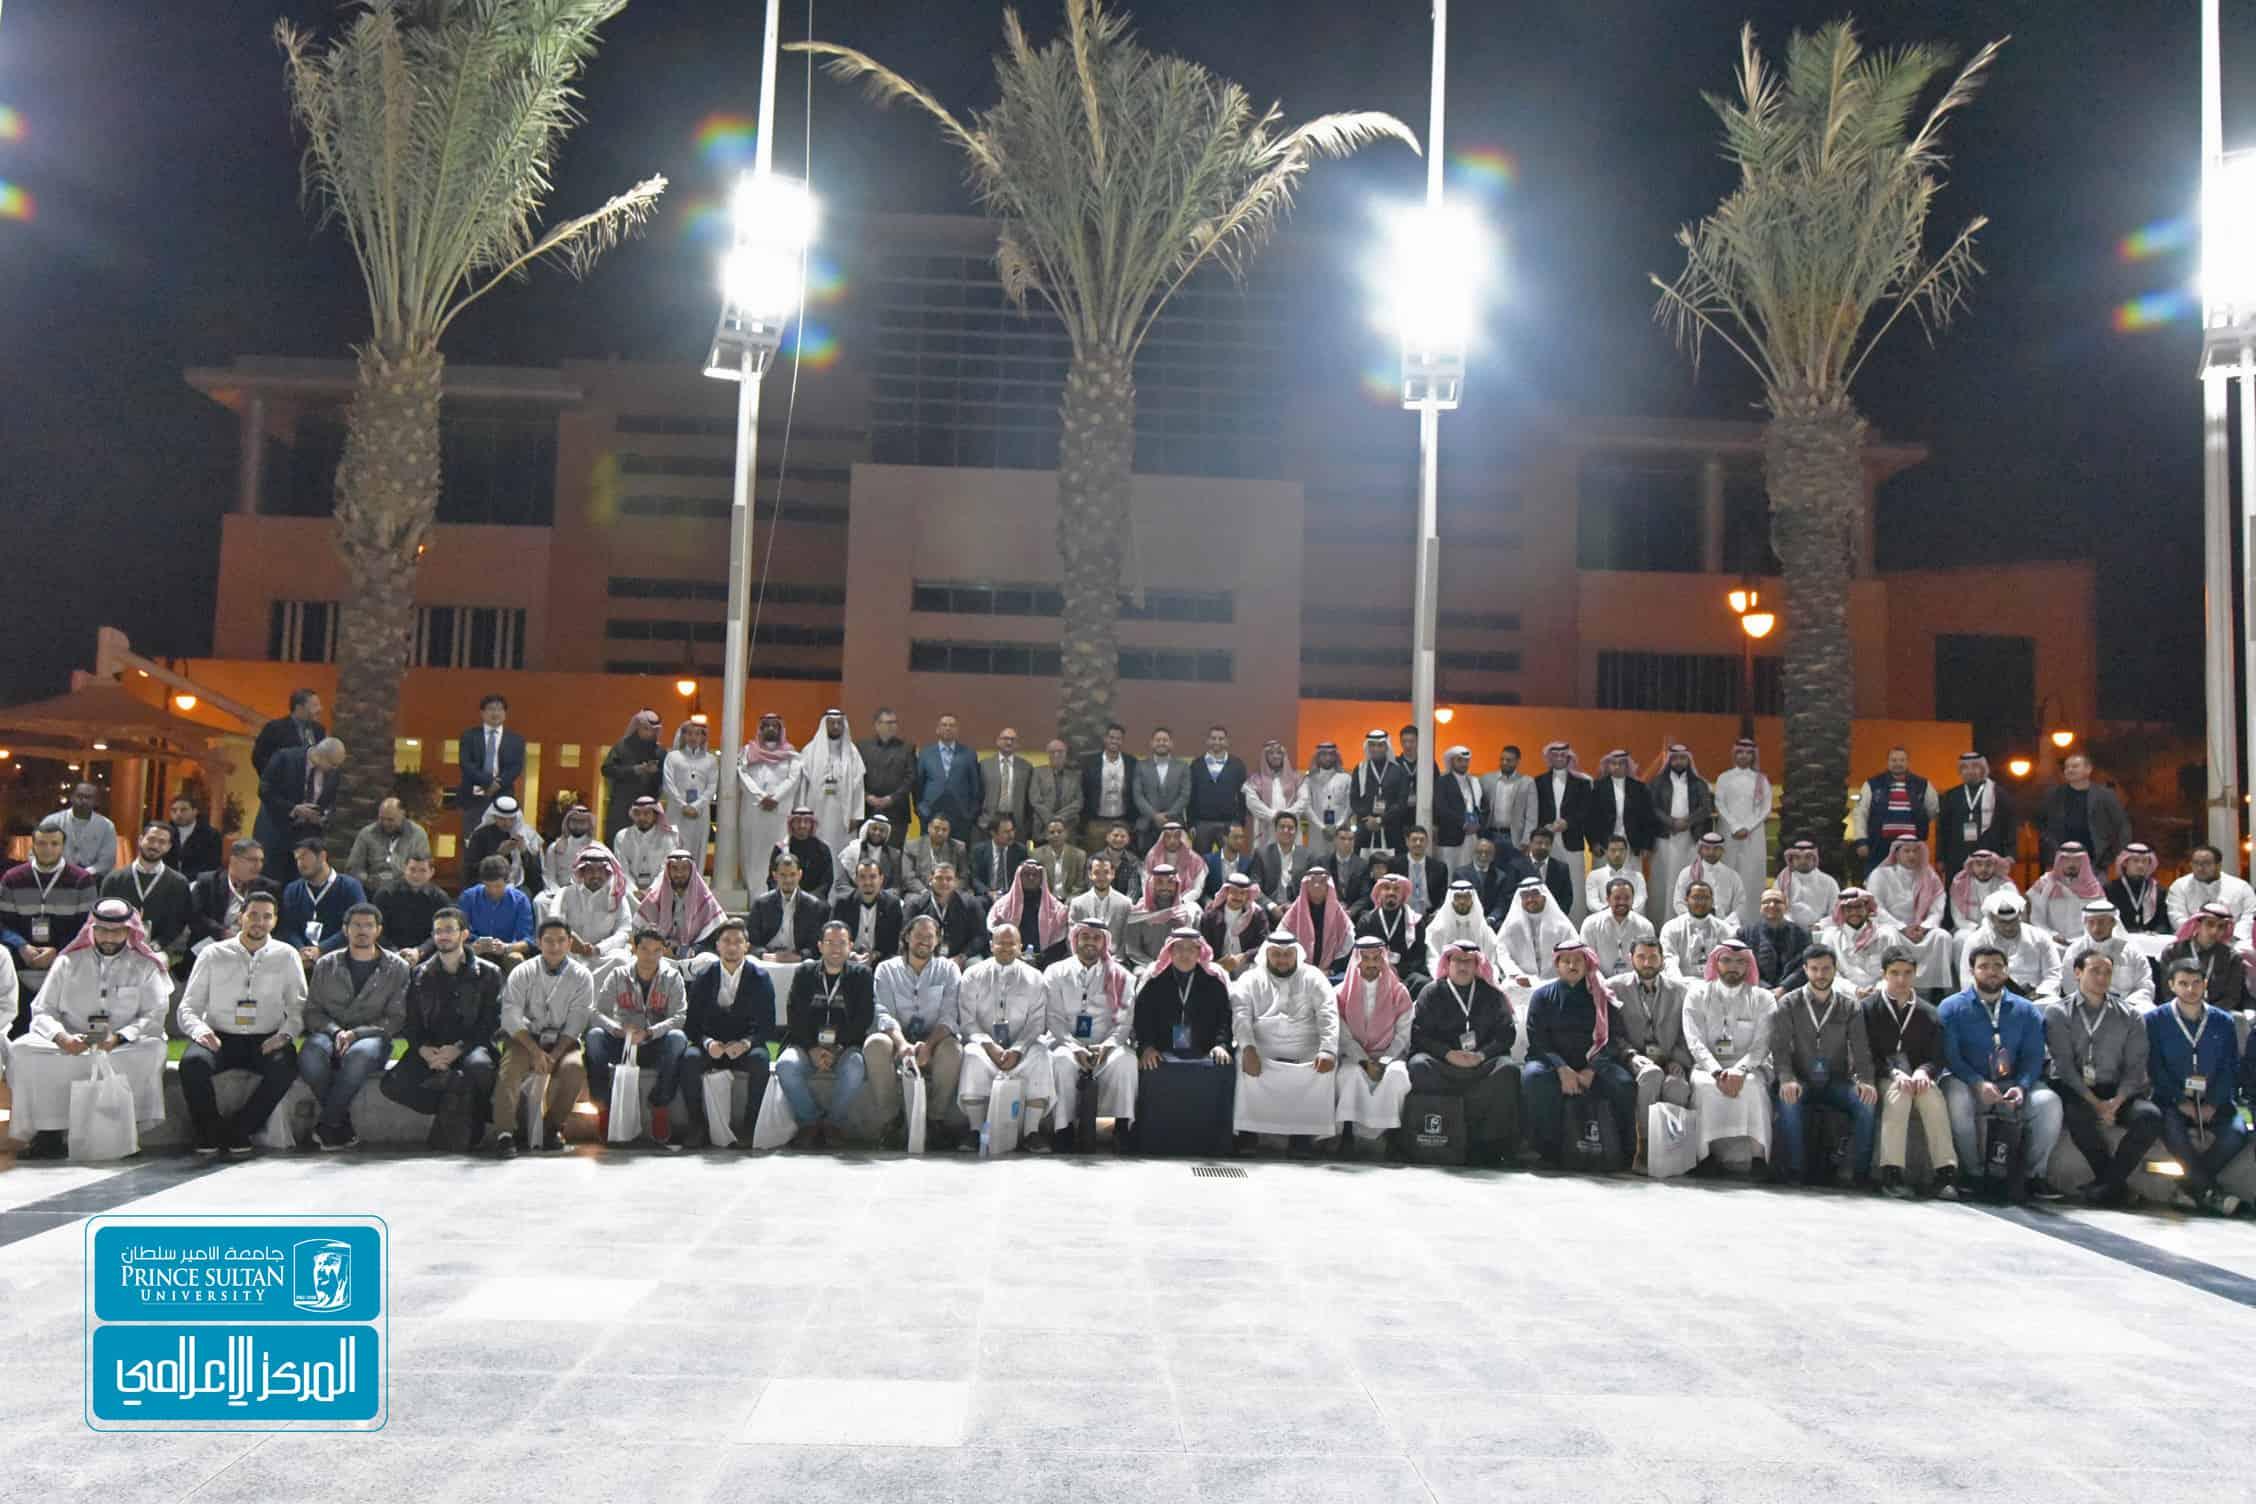 Prince Sultan University Celebrates its Graduates at the First Annual Graduates Forum